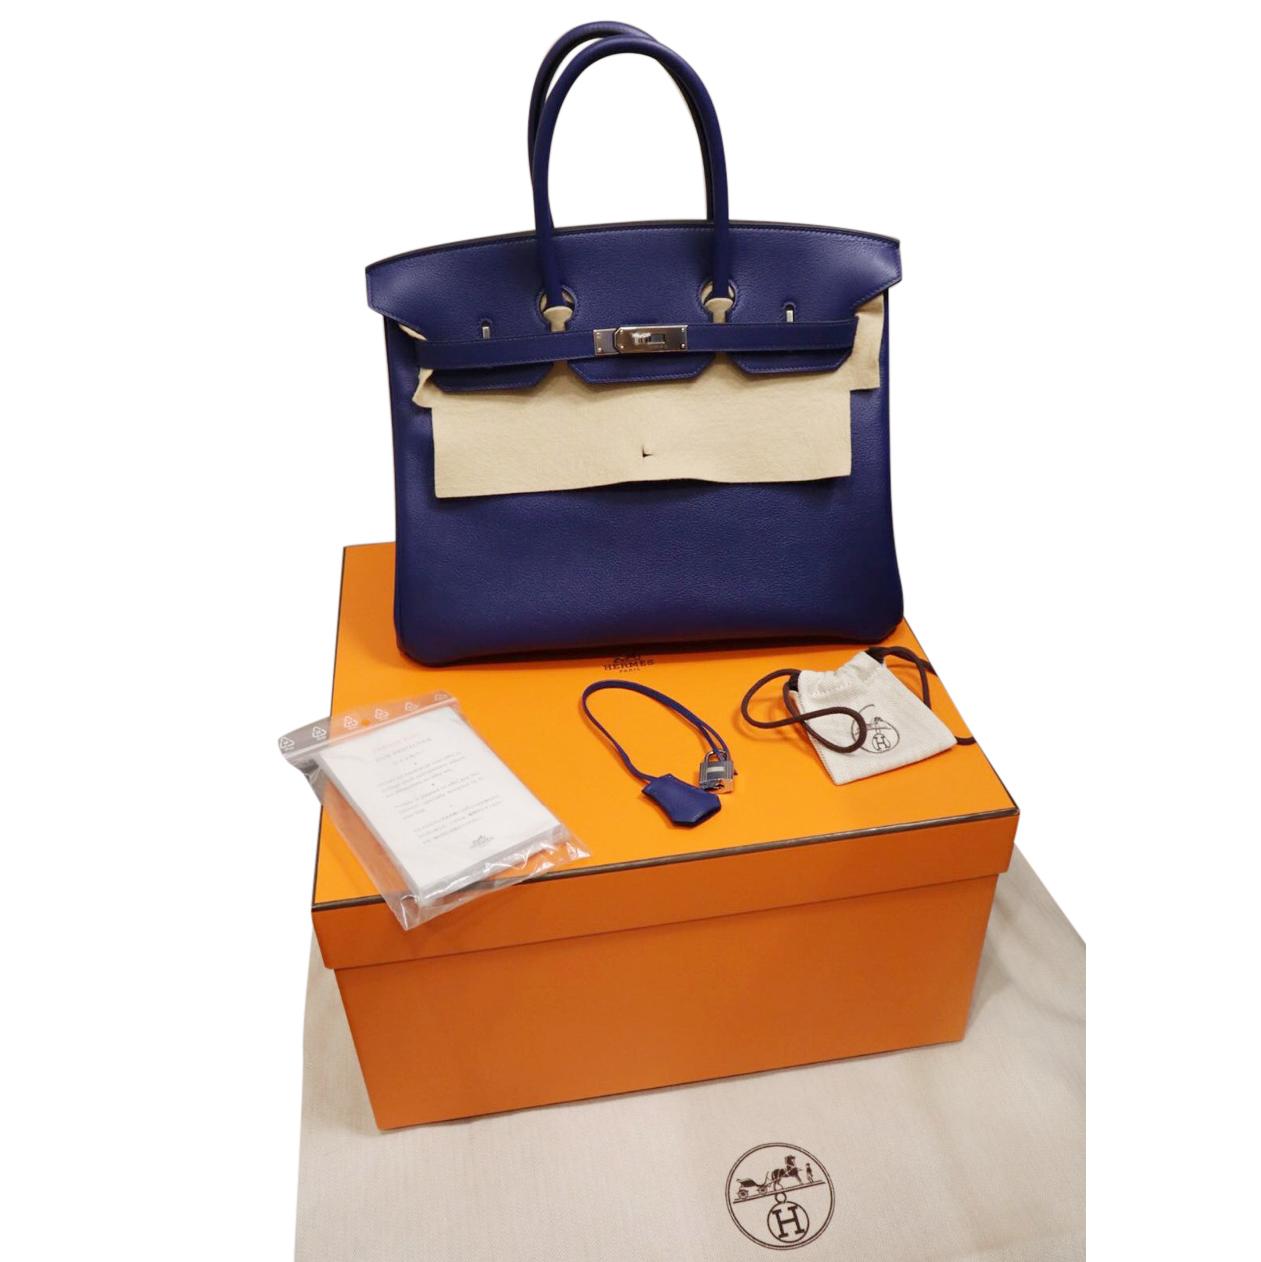 e61f639d80 Hermes Taurillon Novillo Blue Sapphire 35cm Birkin Bag | HEWI London